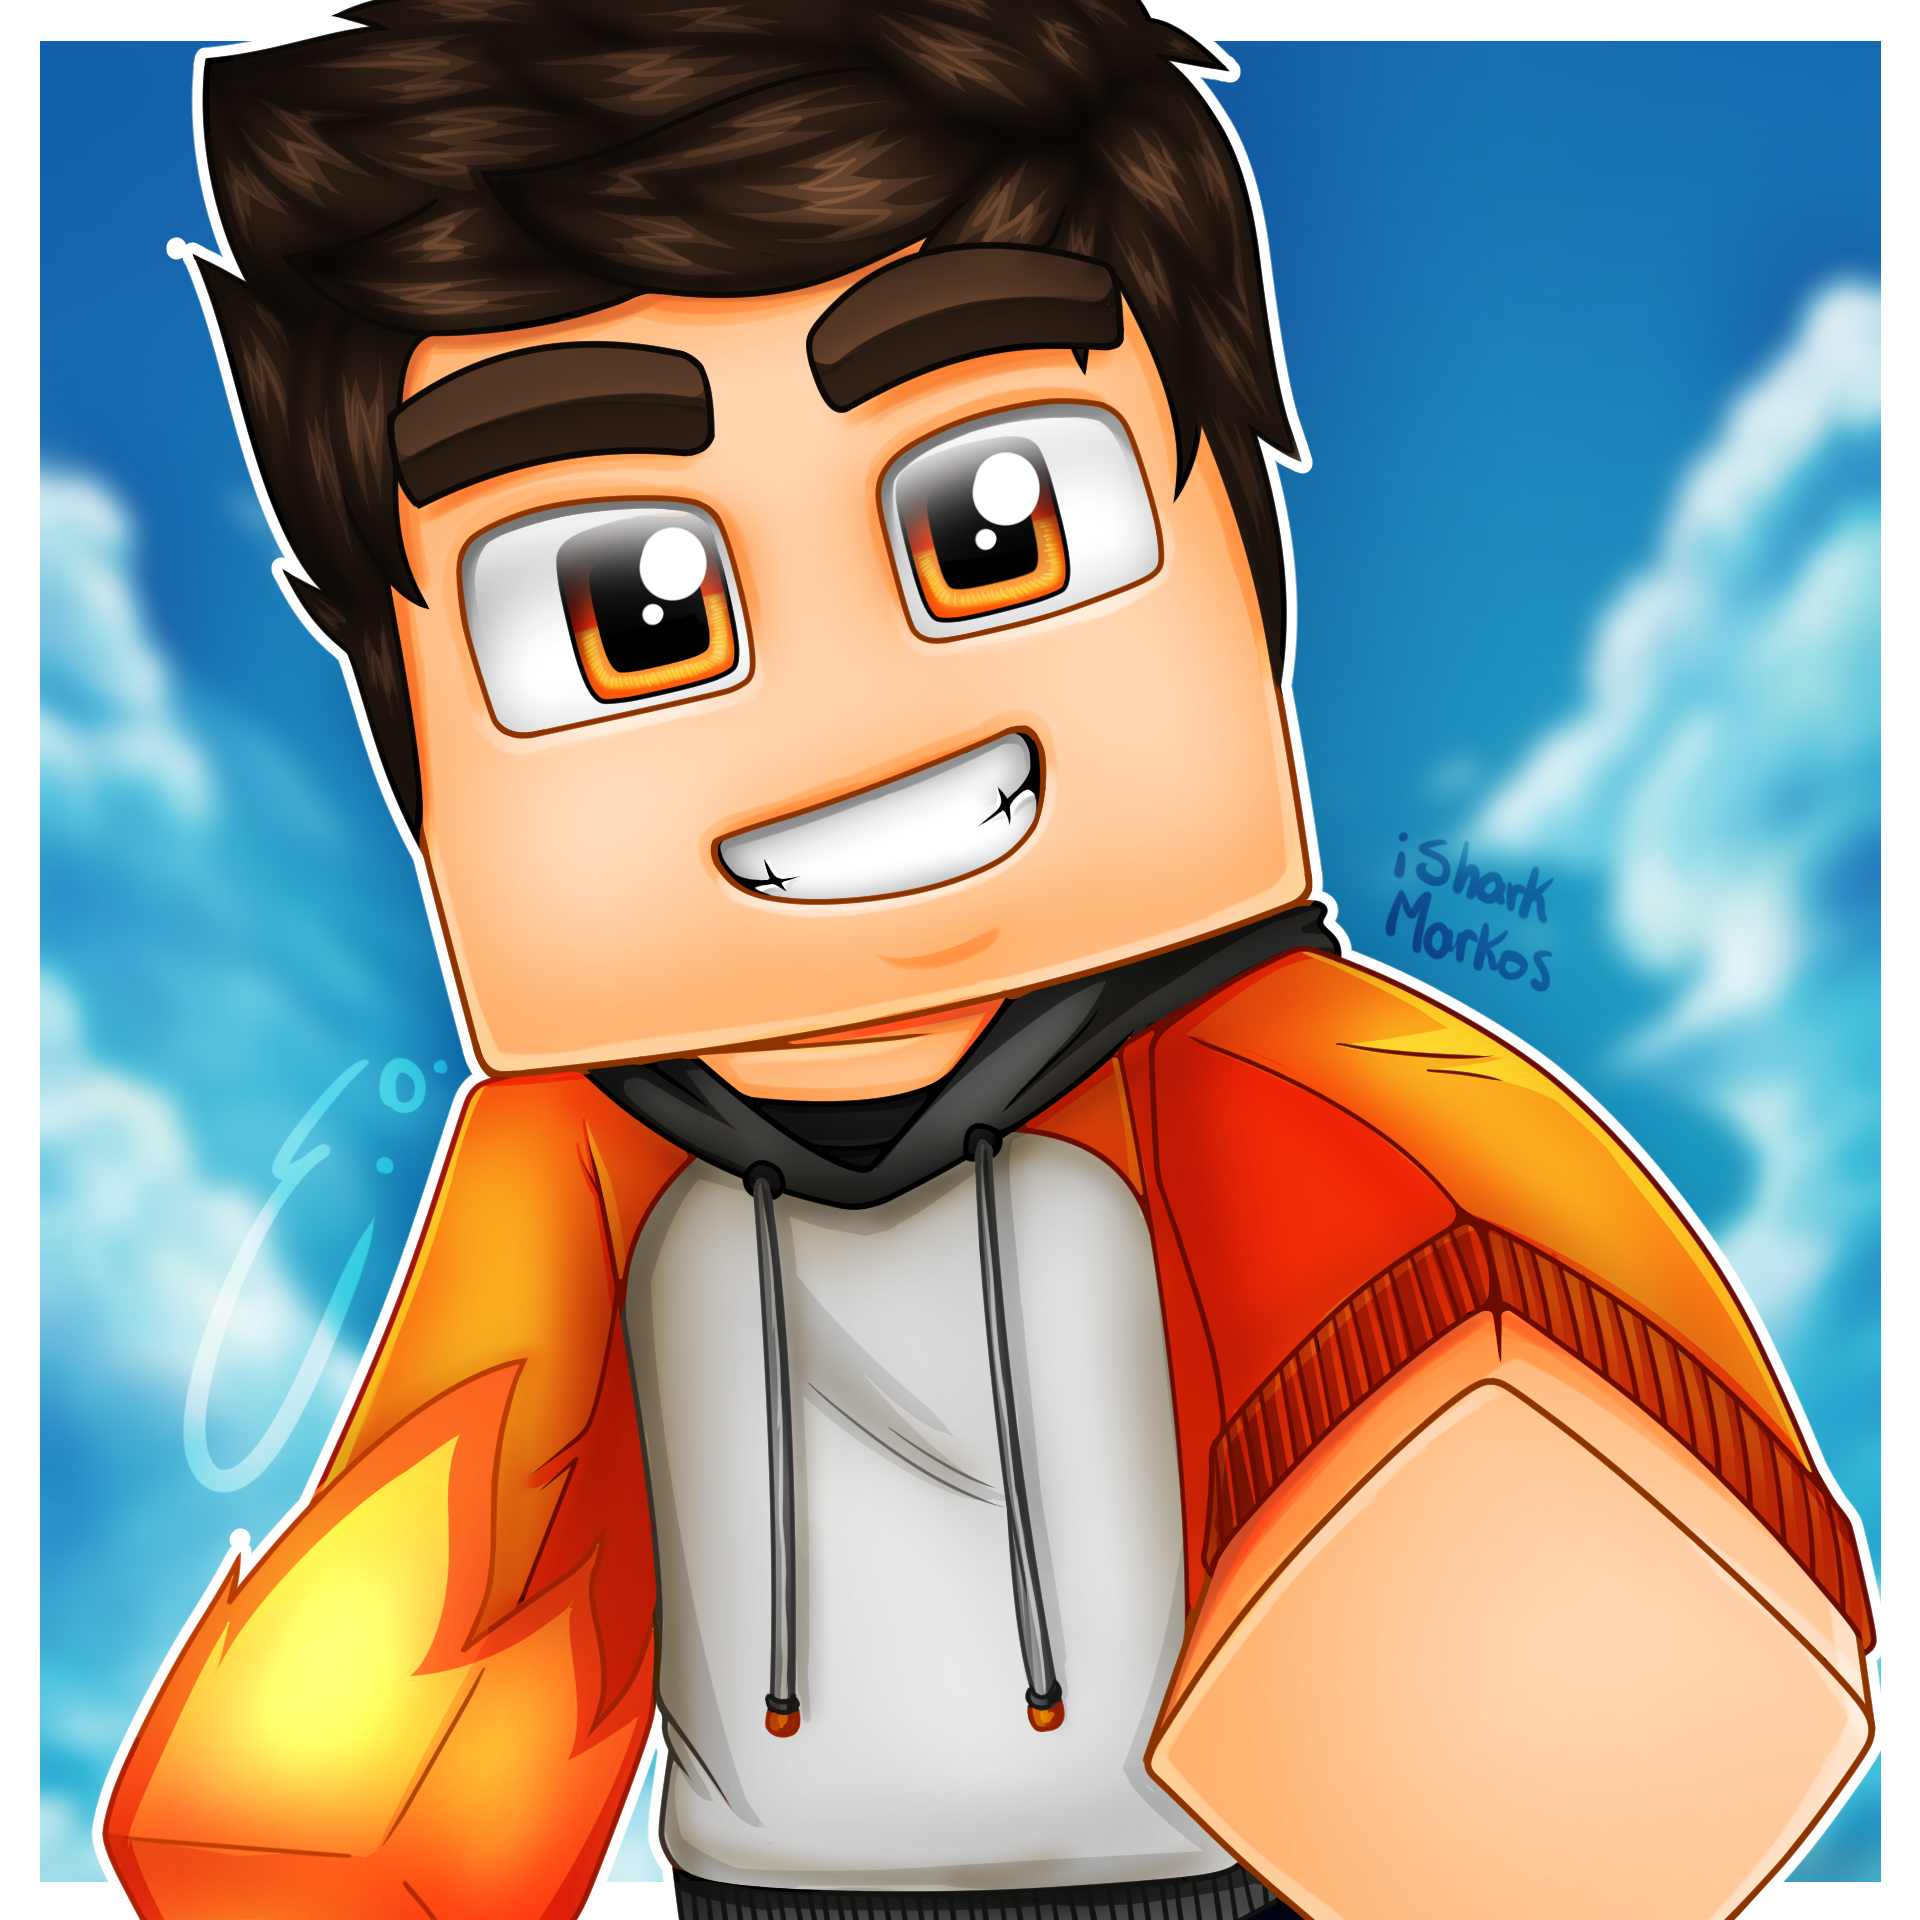 Minecraft Icon Isharkmarkos By Eonofre12 On Deviantart